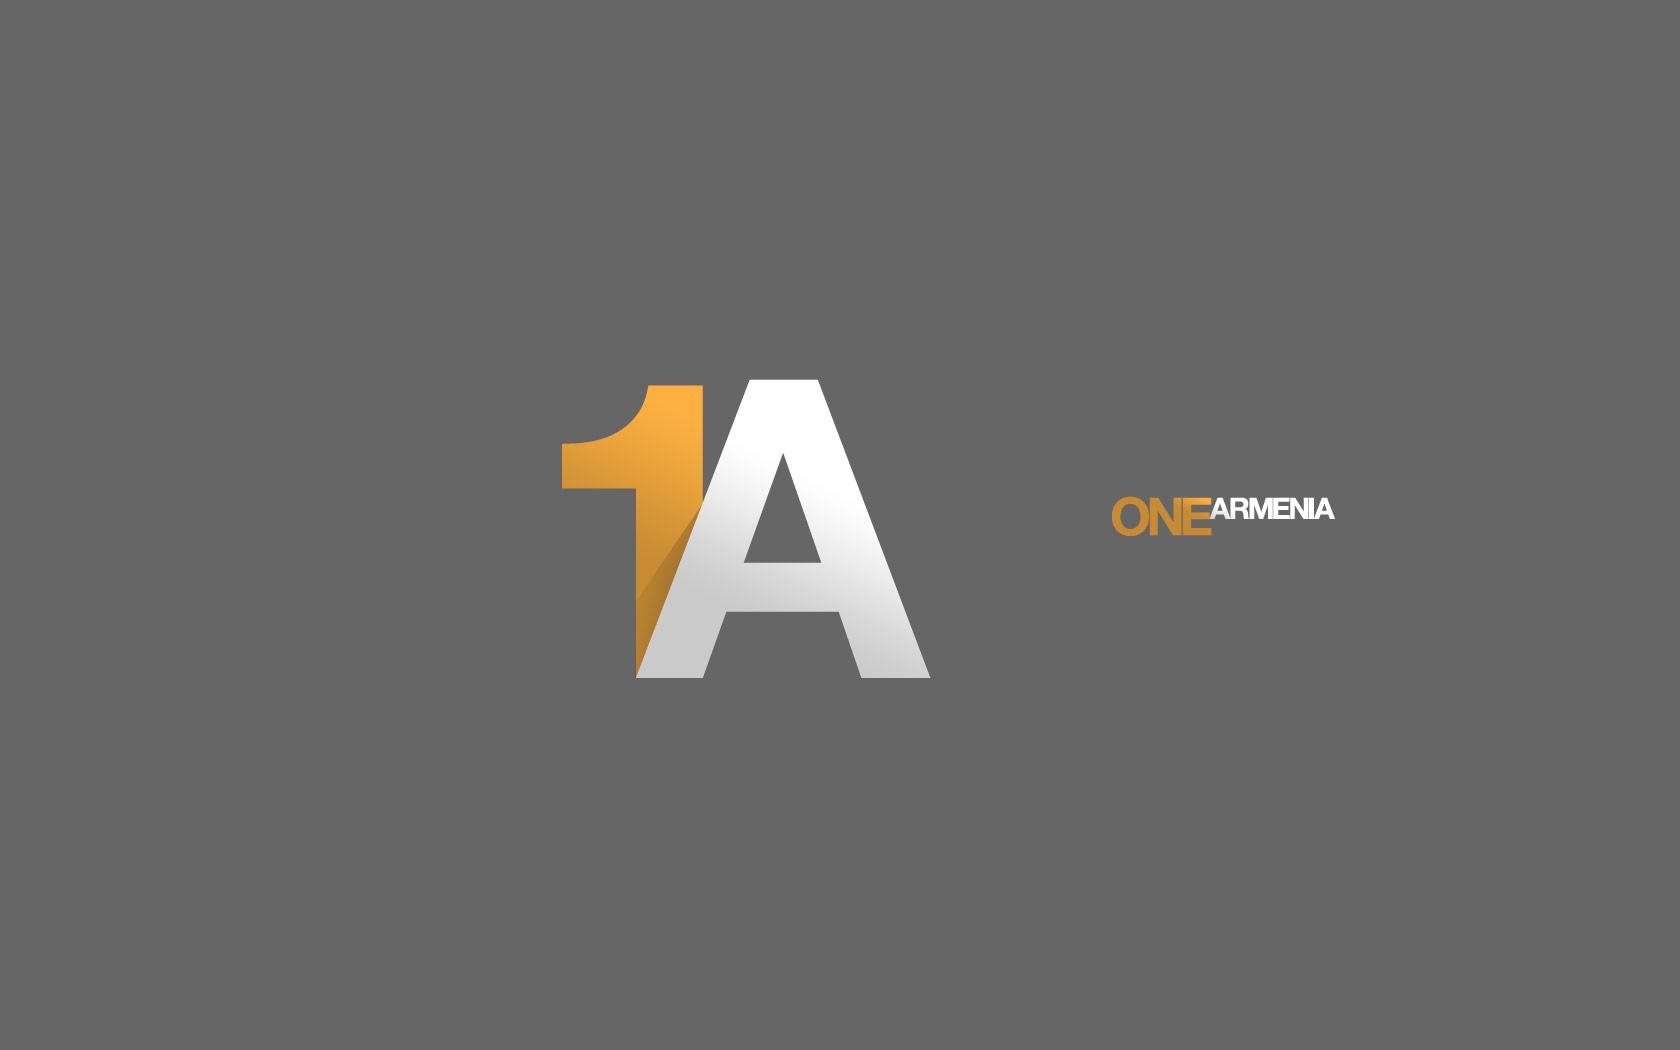 ONE ARMENIA X MAMUS